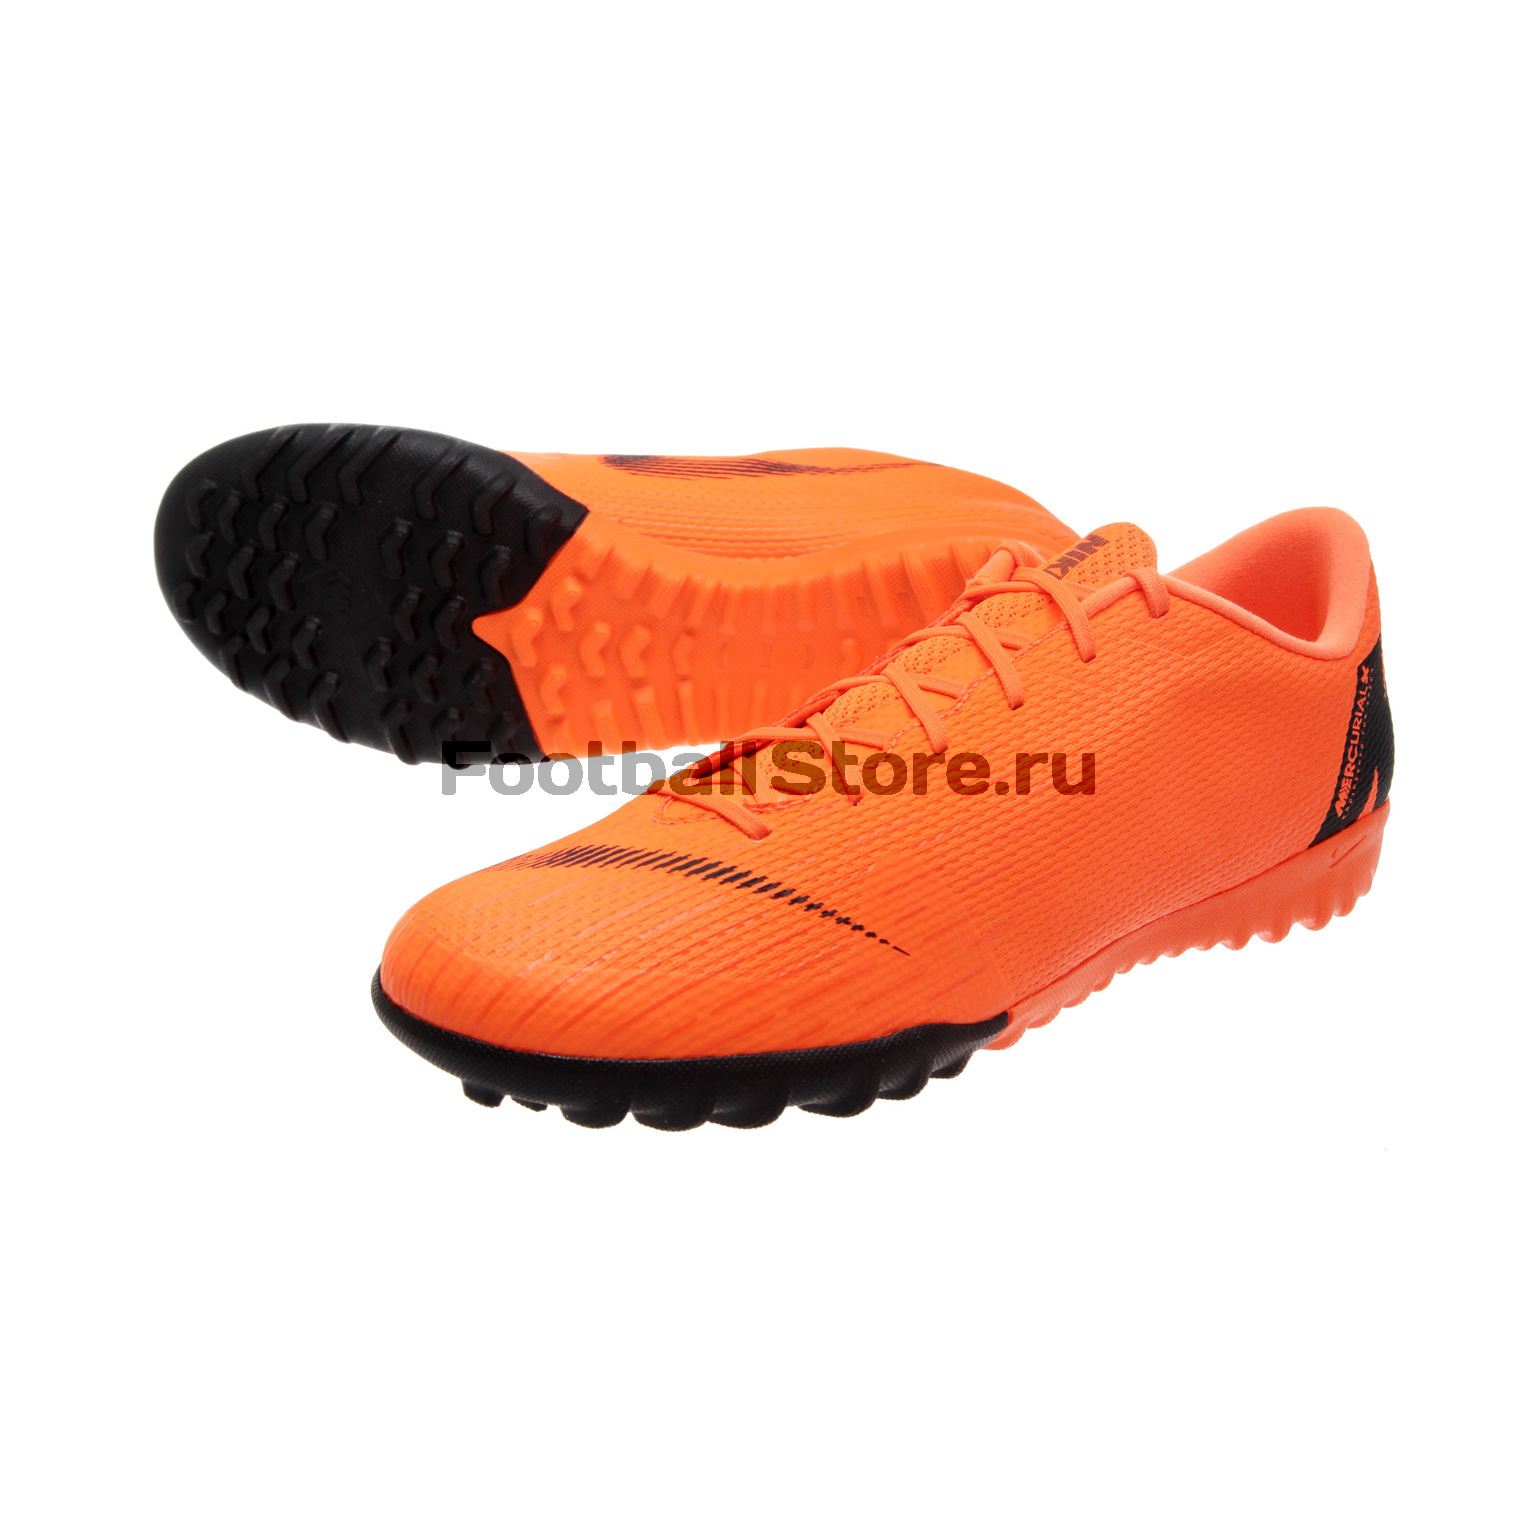 Шиповки Nike VaporX 12 Academy TF AH7384-810 шиповки nike lunar legendx 7 pro tf ah7249 080